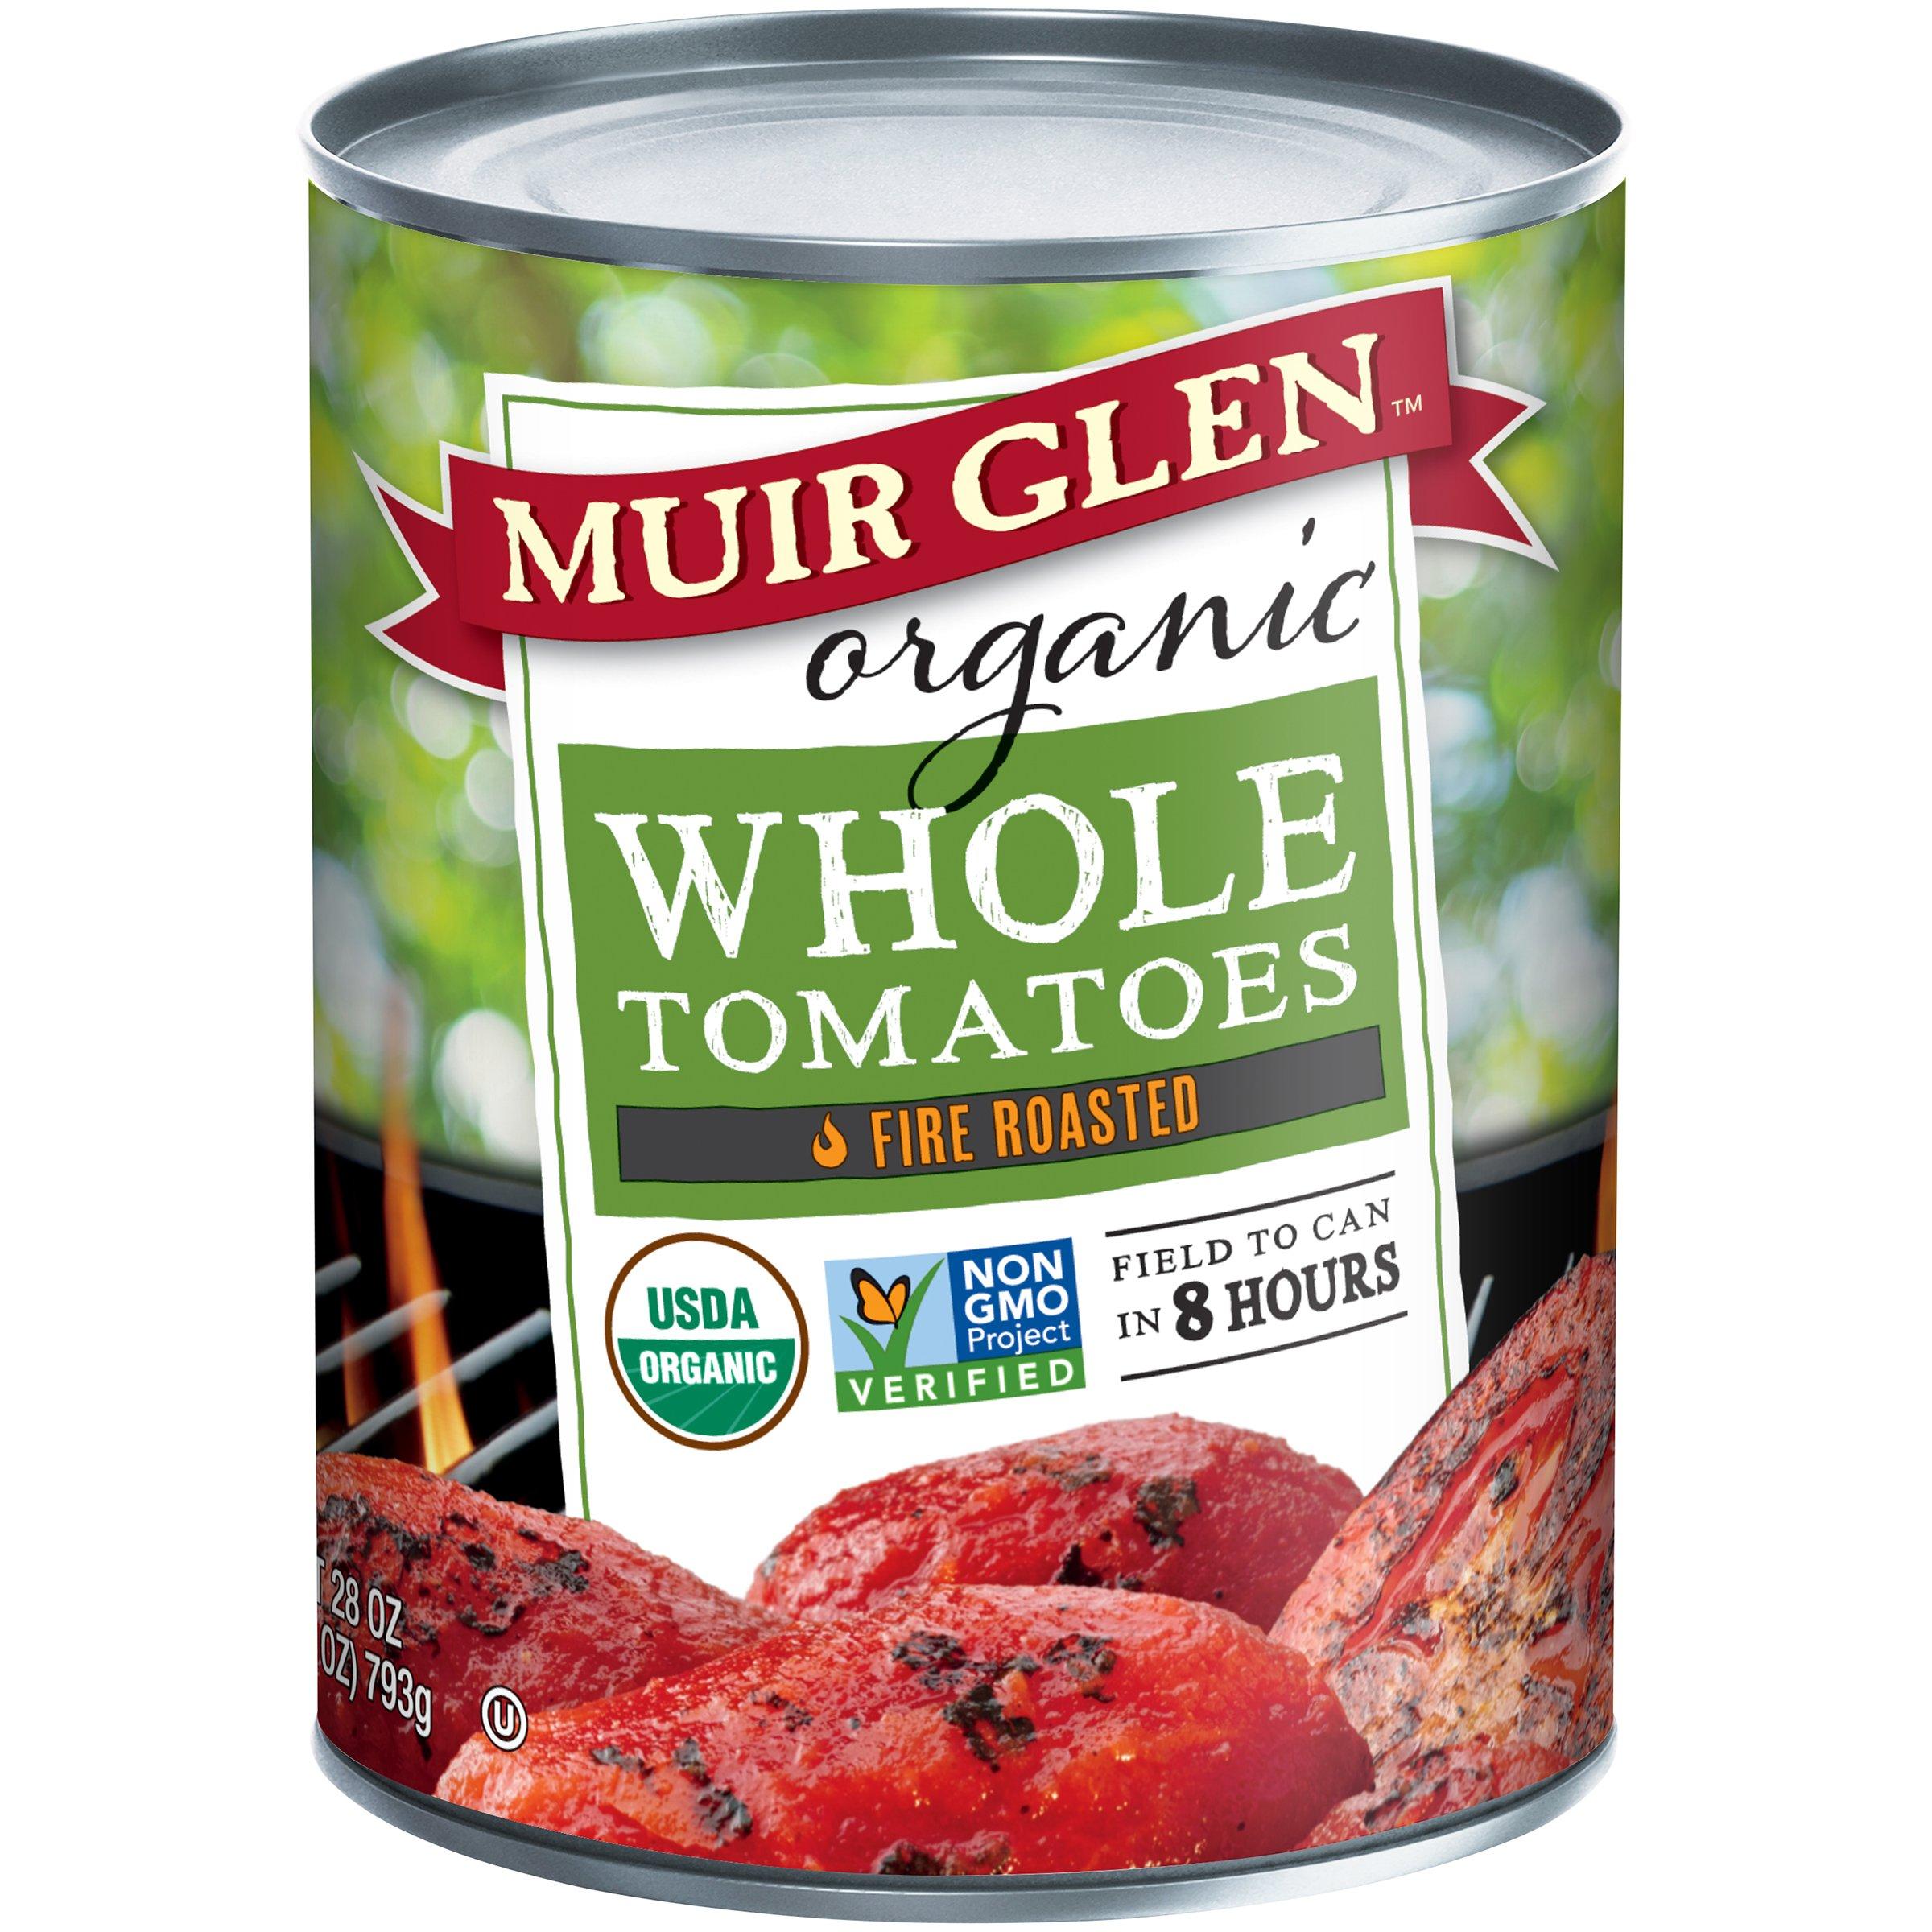 Muir Glen Organic Fire Roasted Whole Tomatoes, 28 oz